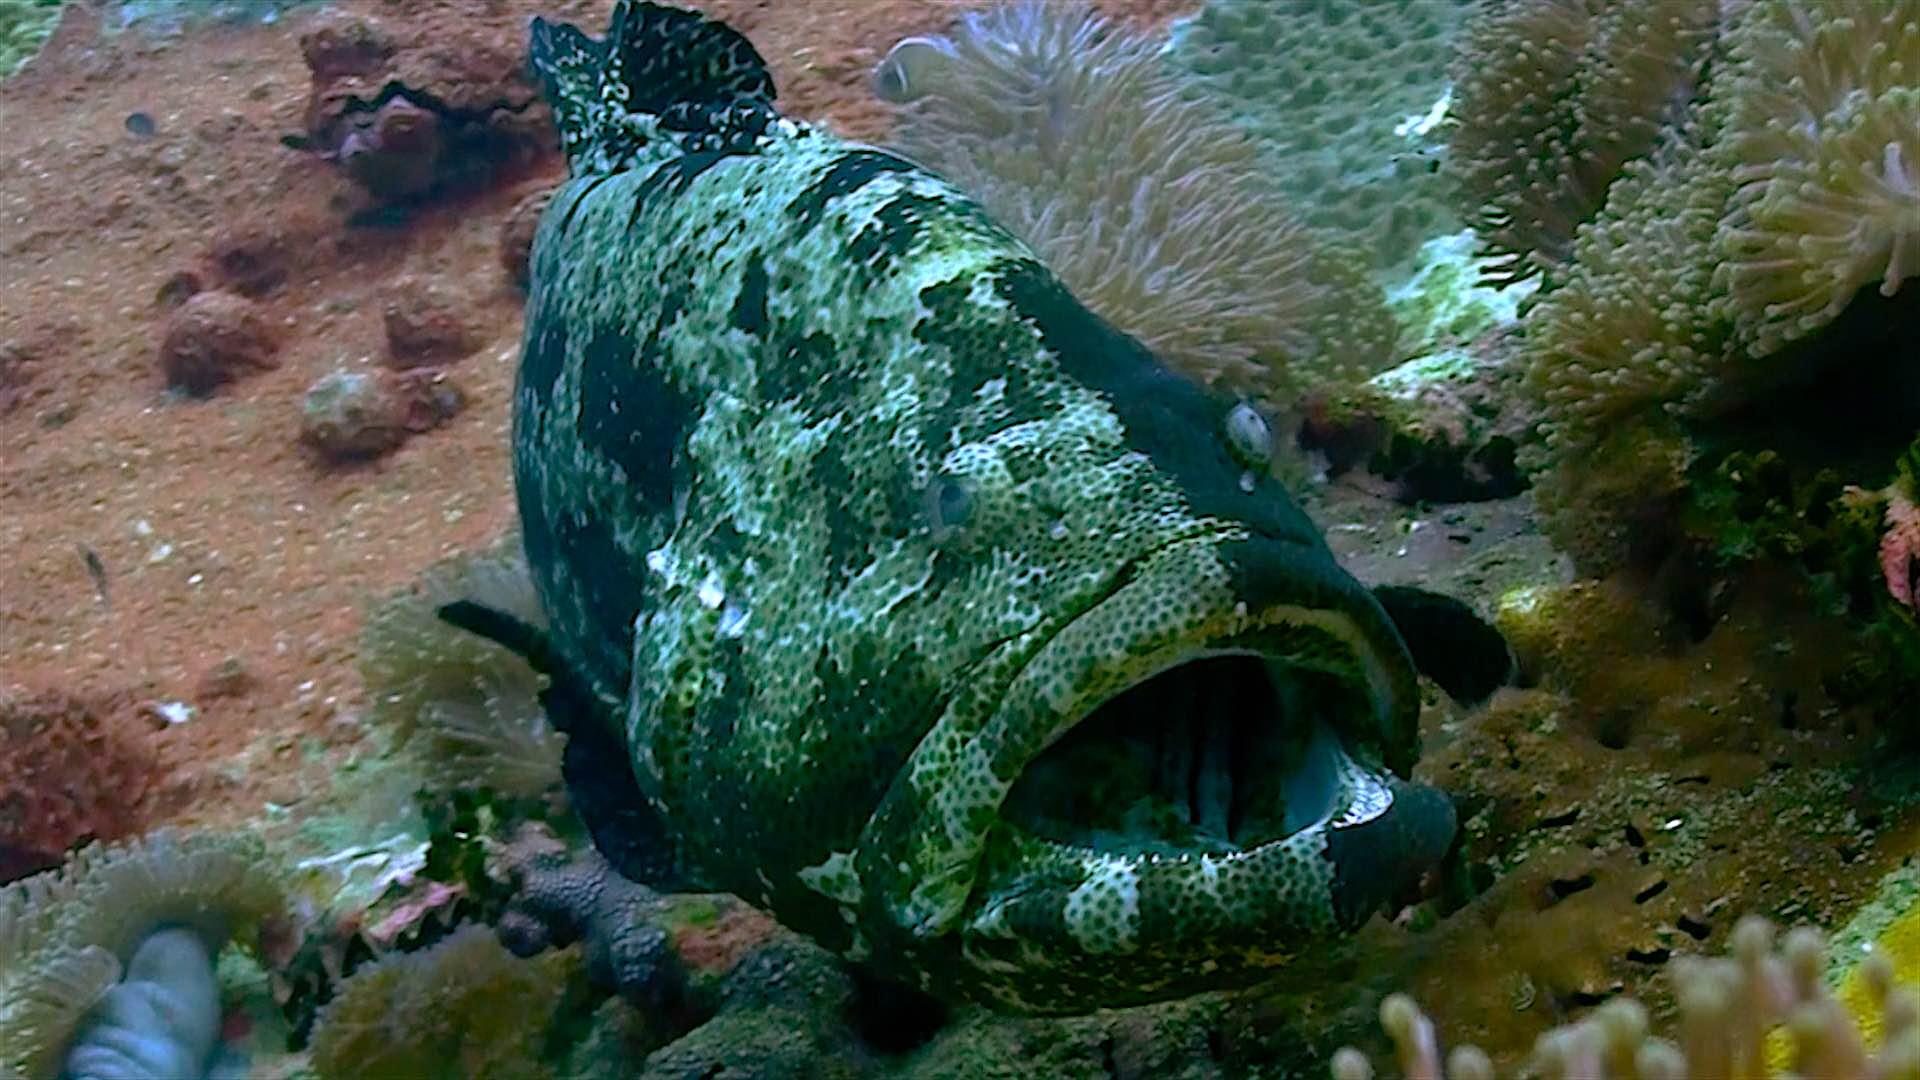 www.thefunkyturtle.com chumphon dive site koh tao grouper